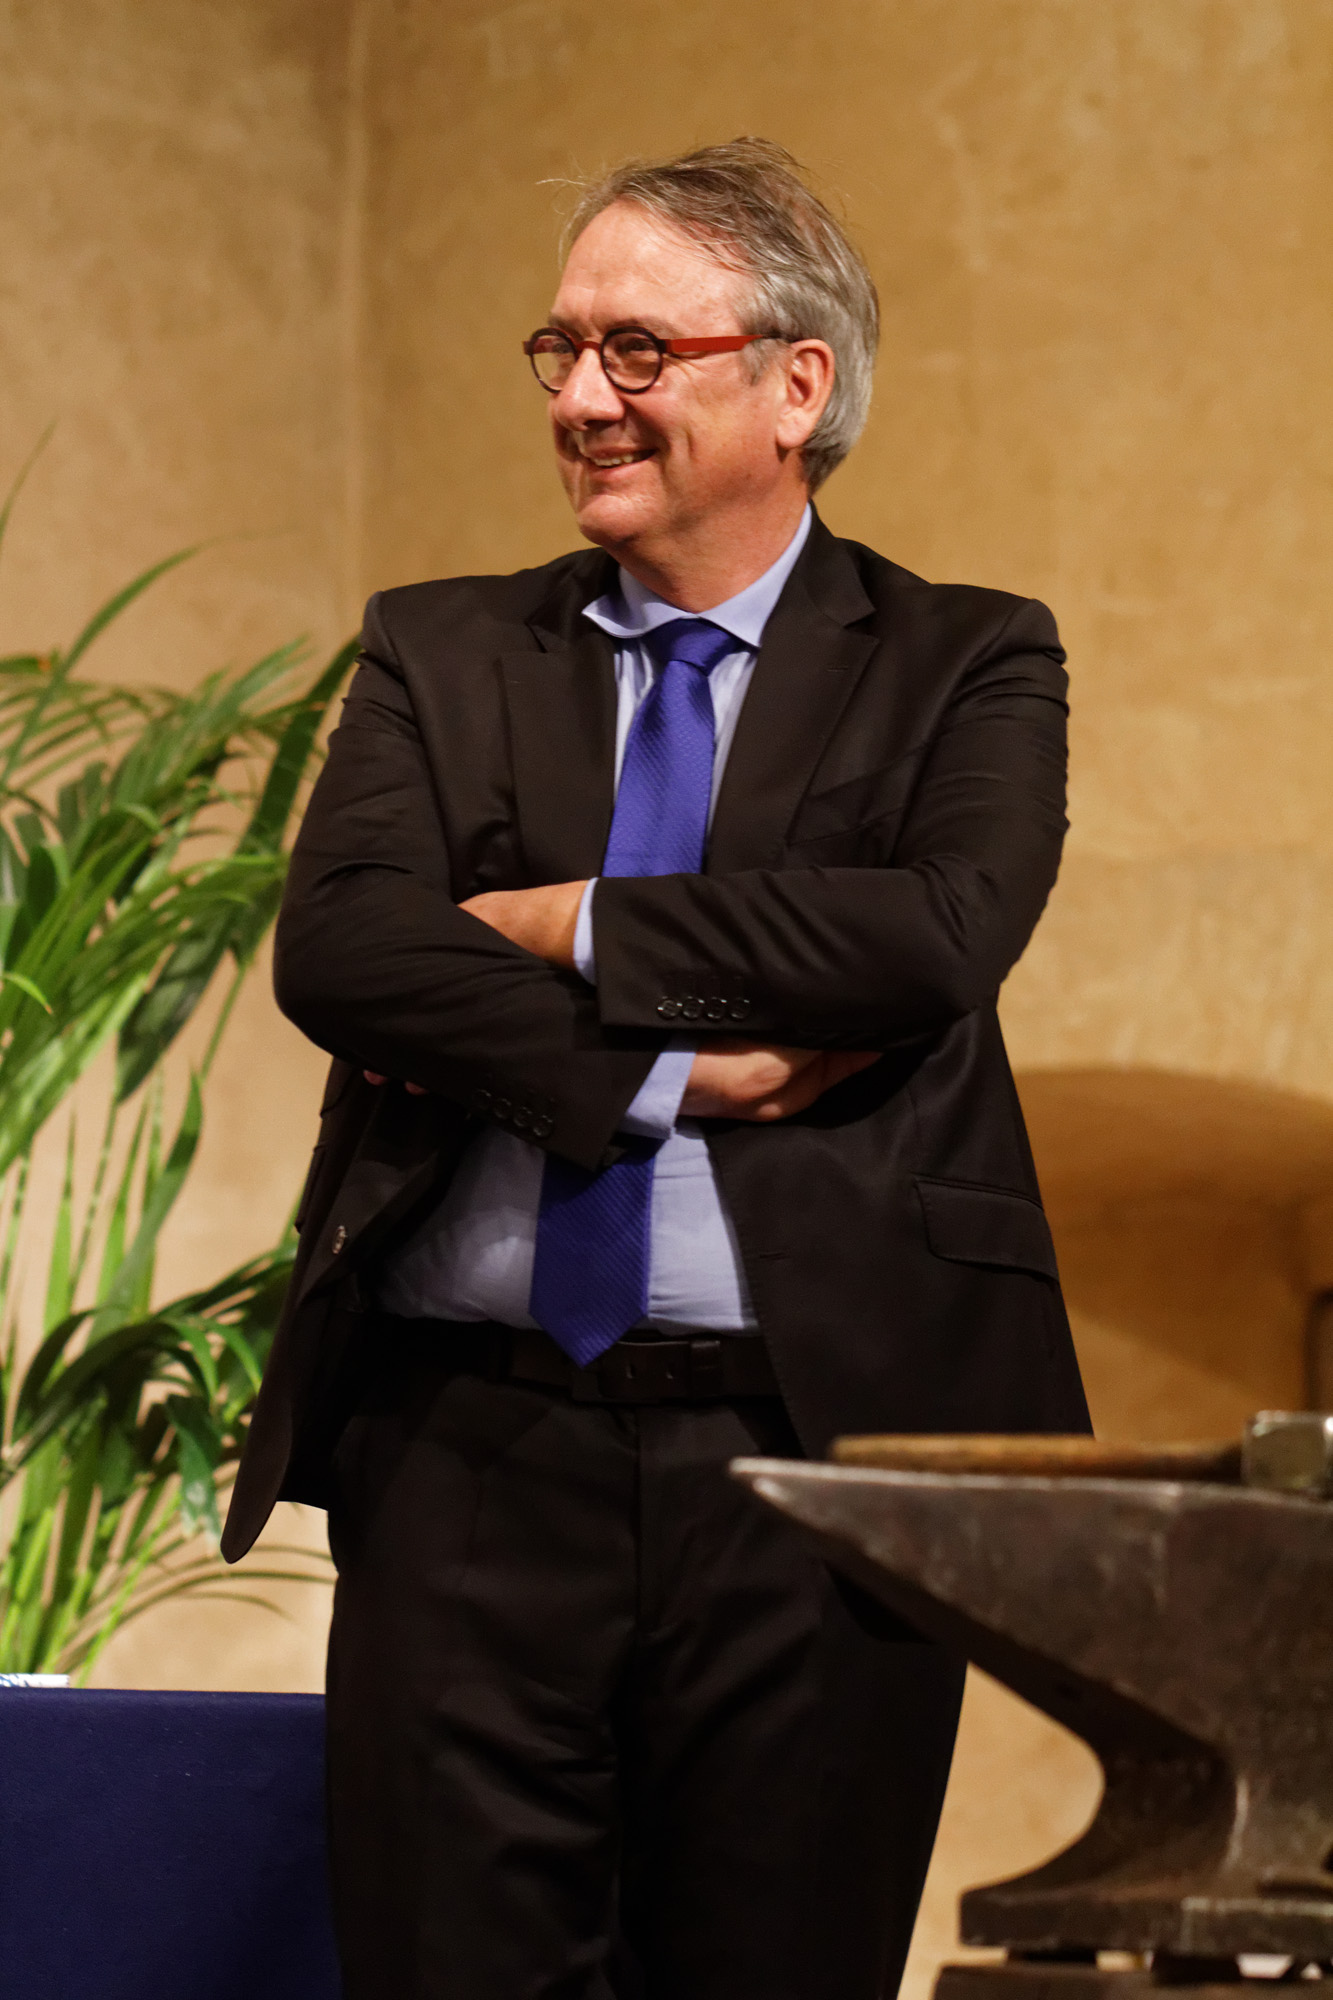 Claude JOLLY